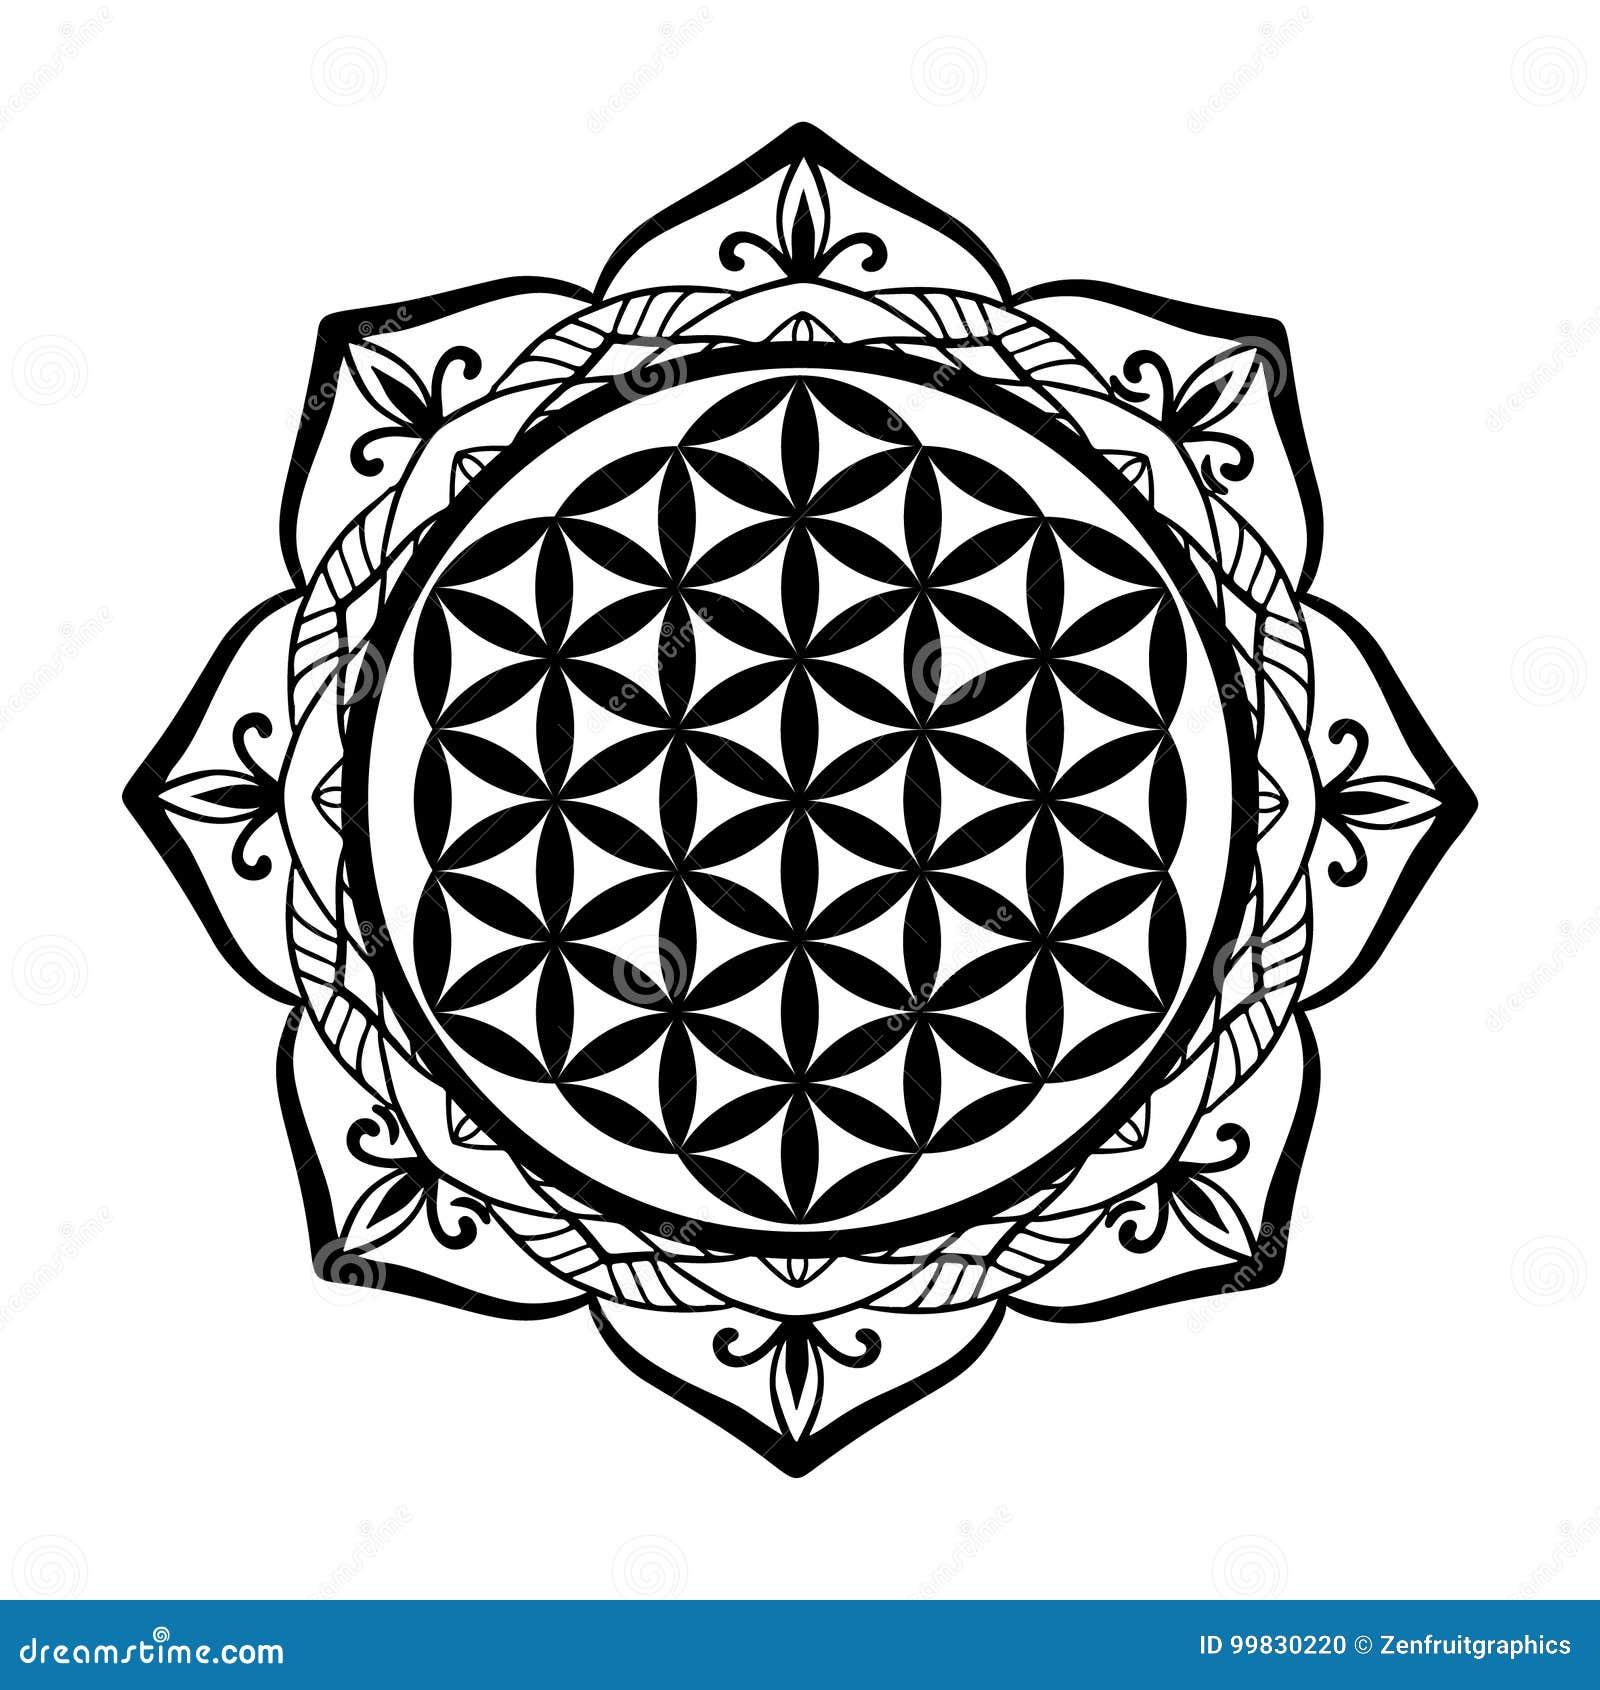 Marco de la mandala y flor del tatuaje o de la plantilla de la plantilla, alquimia sagrada del símbolo de la geometría, espiritua